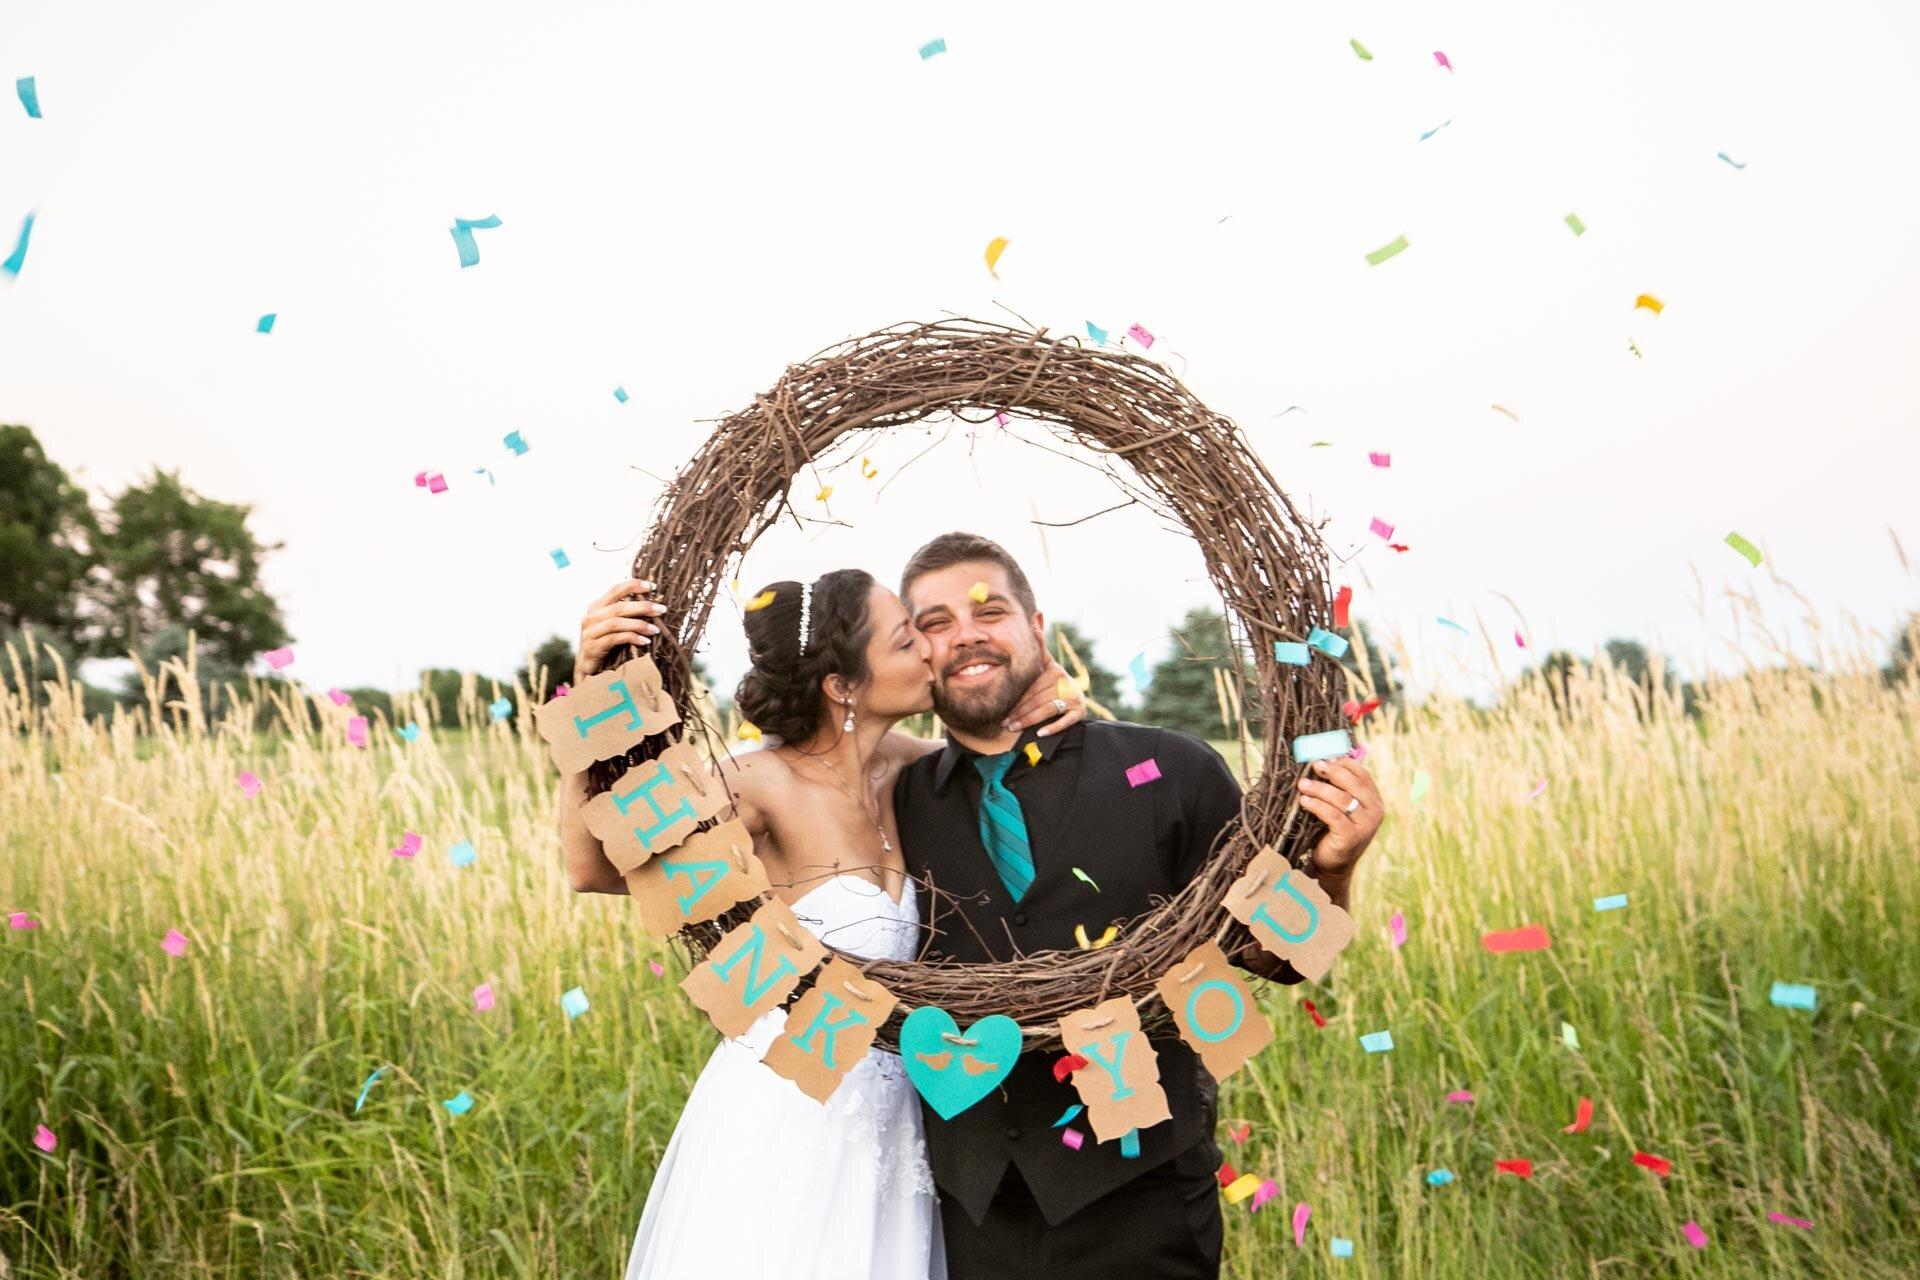 adam-shea-photography-fall-autumn-lighting-engagement-wedding-photos-adam-shea-photography-green-bay-appleton-neenah-photographer-13.jpg